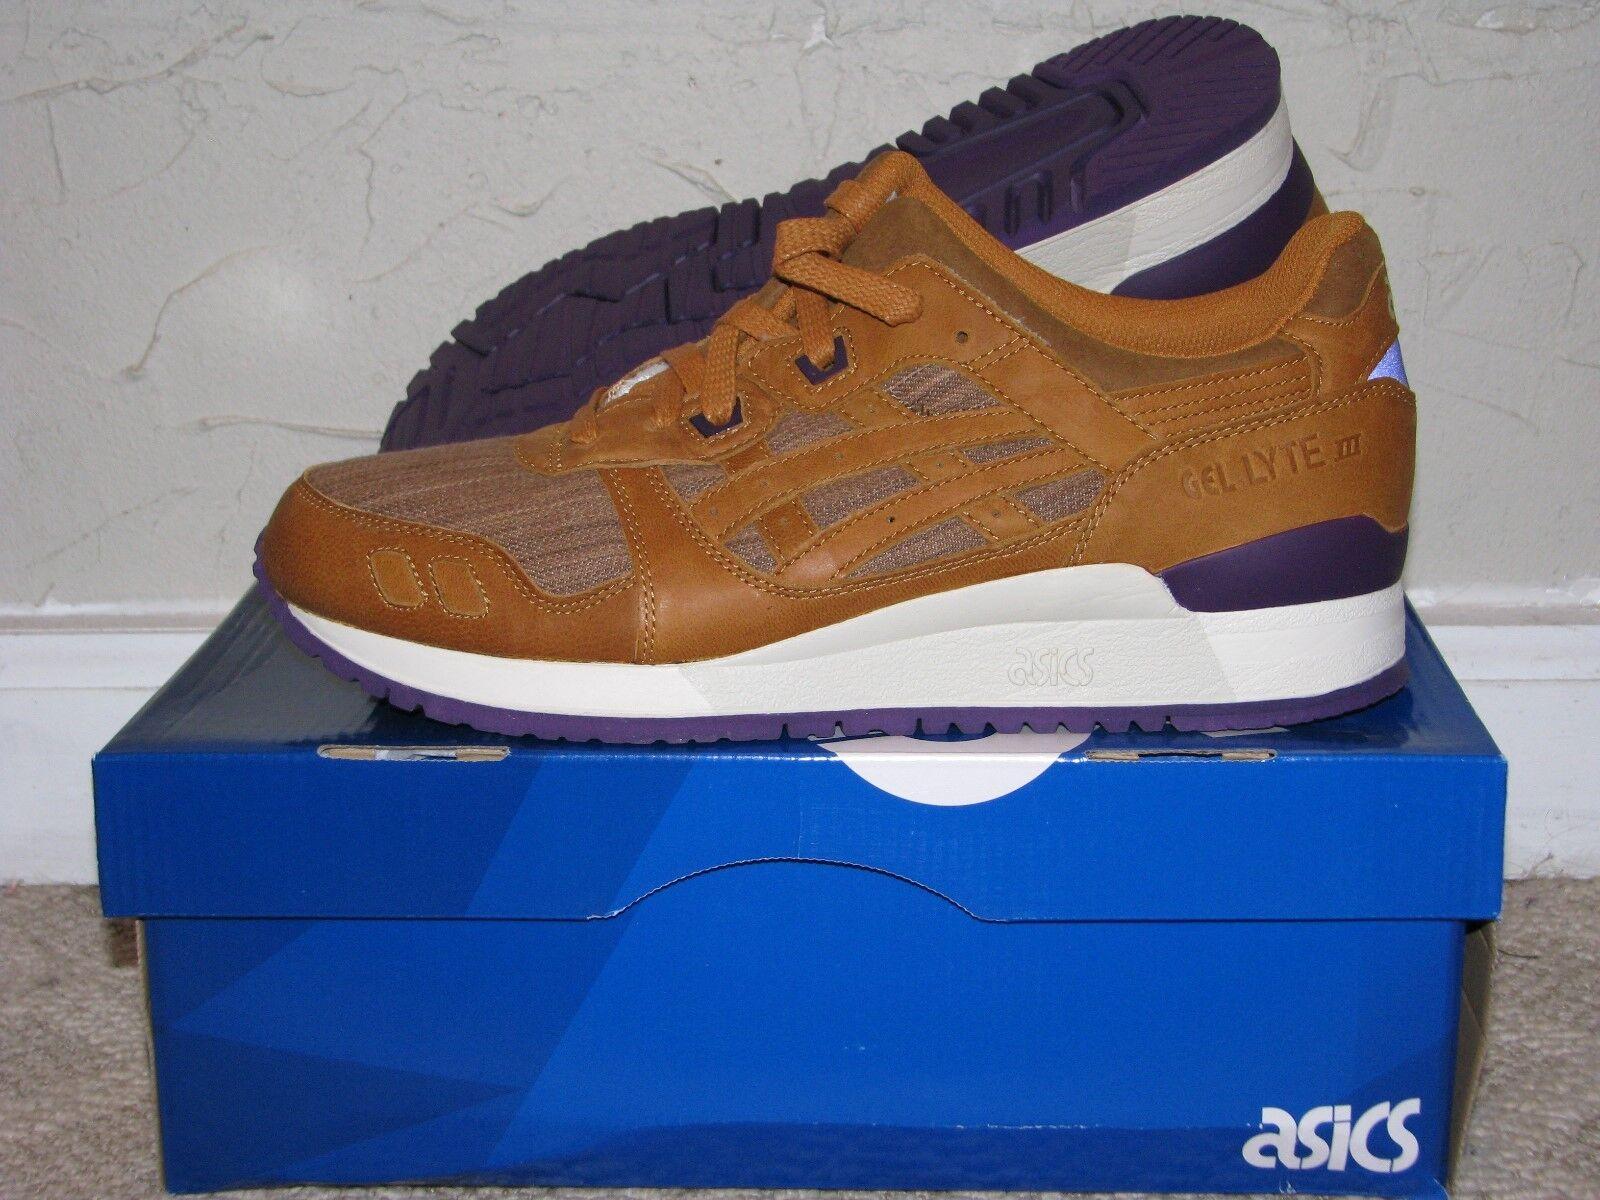 Asics Gel Lyte III 3 'Kakishibu' Tan / Purple Mens Size 10 DS NEW! HN502-7171